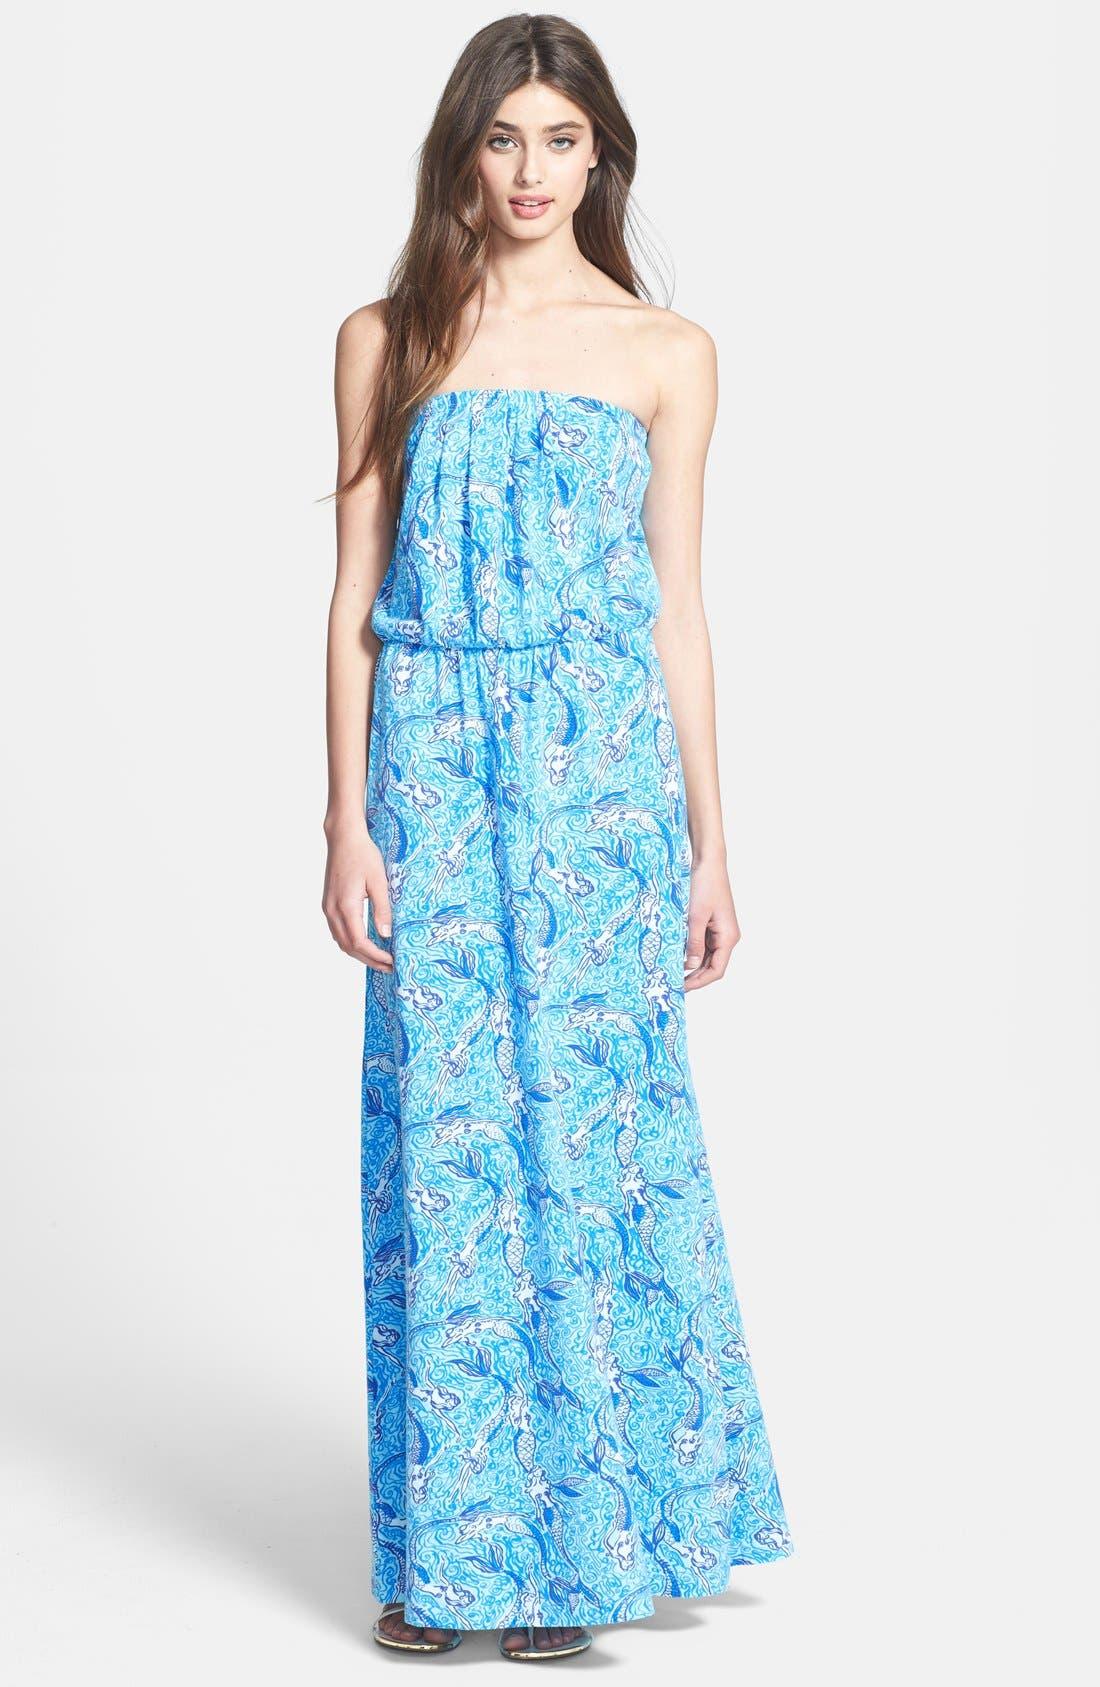 Alternate Image 1 Selected - Lilly Pulitzer® 'Marlisa' Print Blouson Jersey Maxi Dress